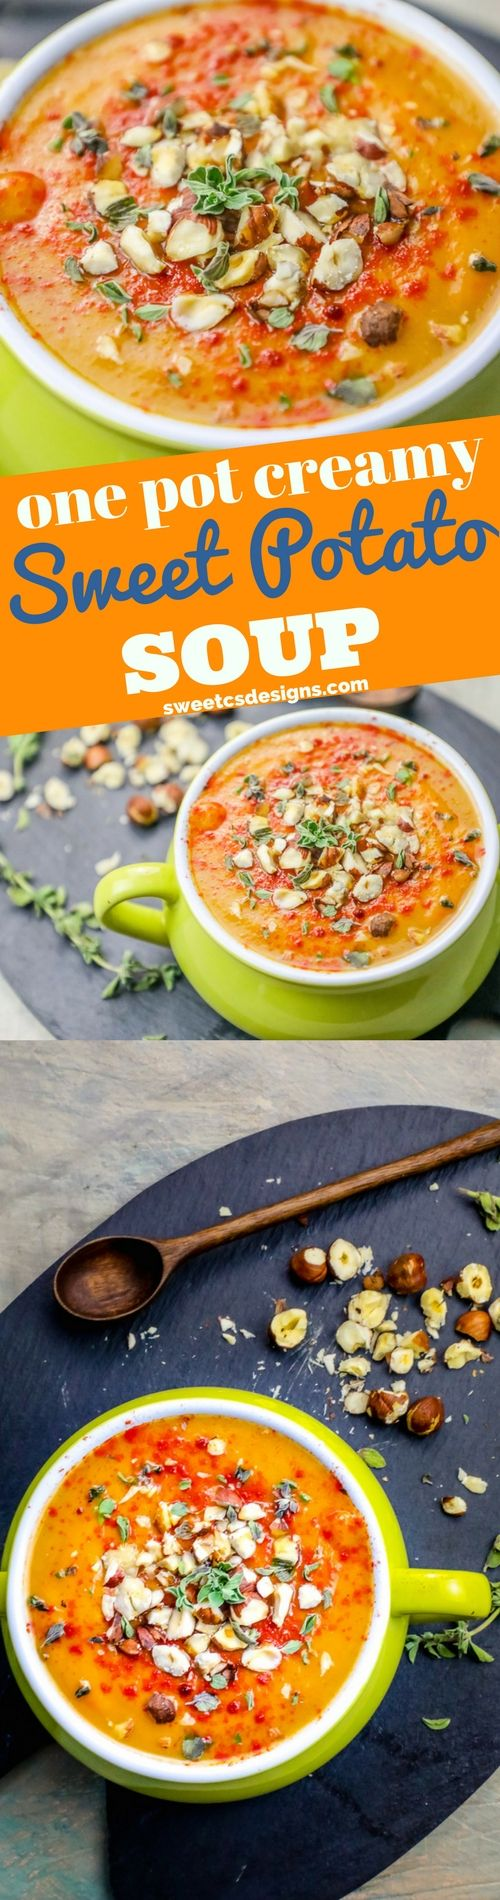 Creamy Sweet Potato Soup with Hazelnuts ⋆ Sweet C's Designs